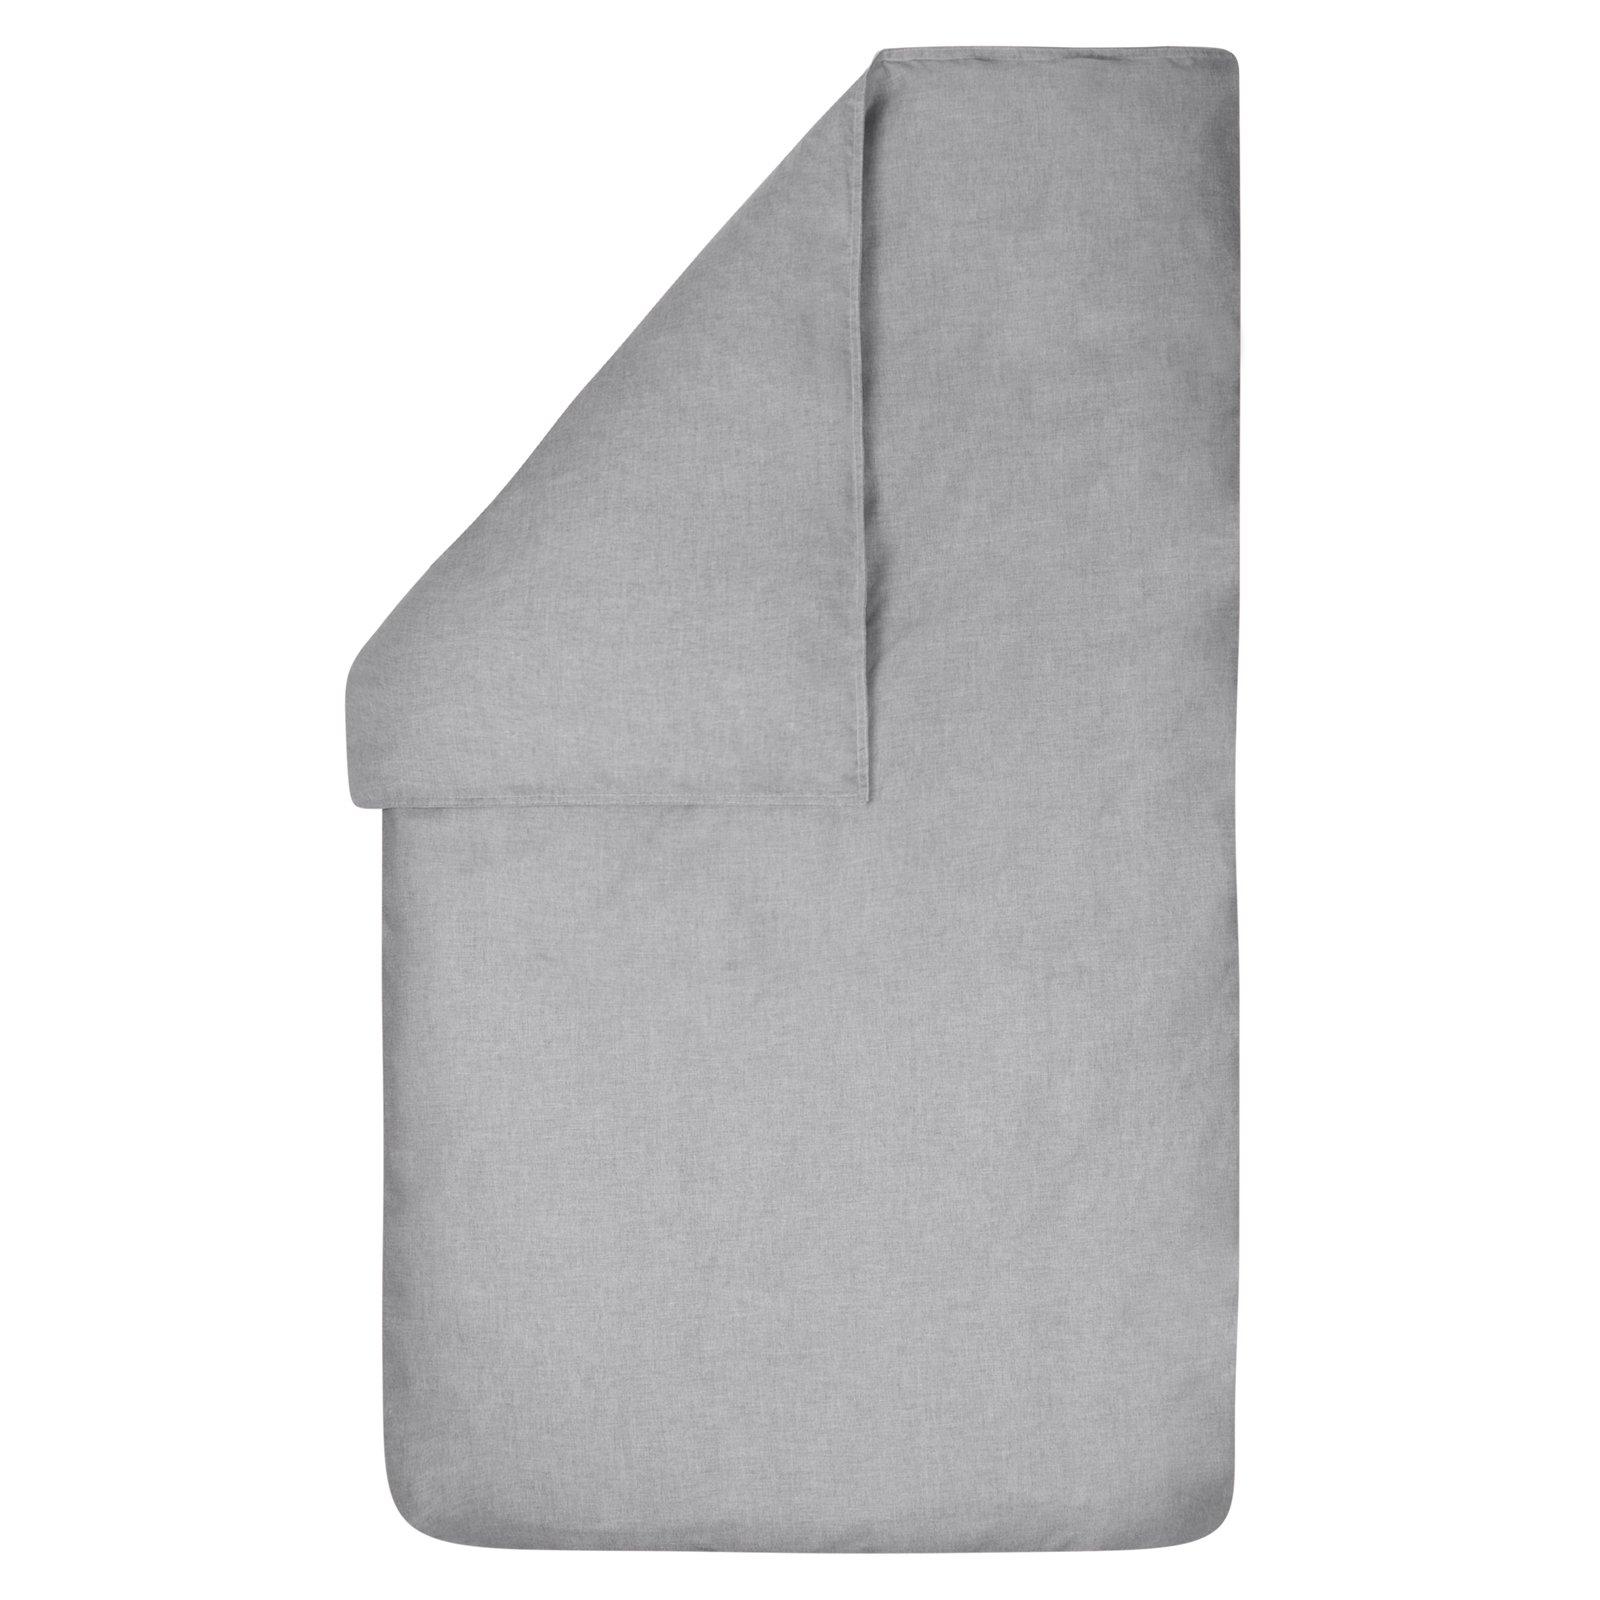 dekbedovertrek Bo grijs 60×80